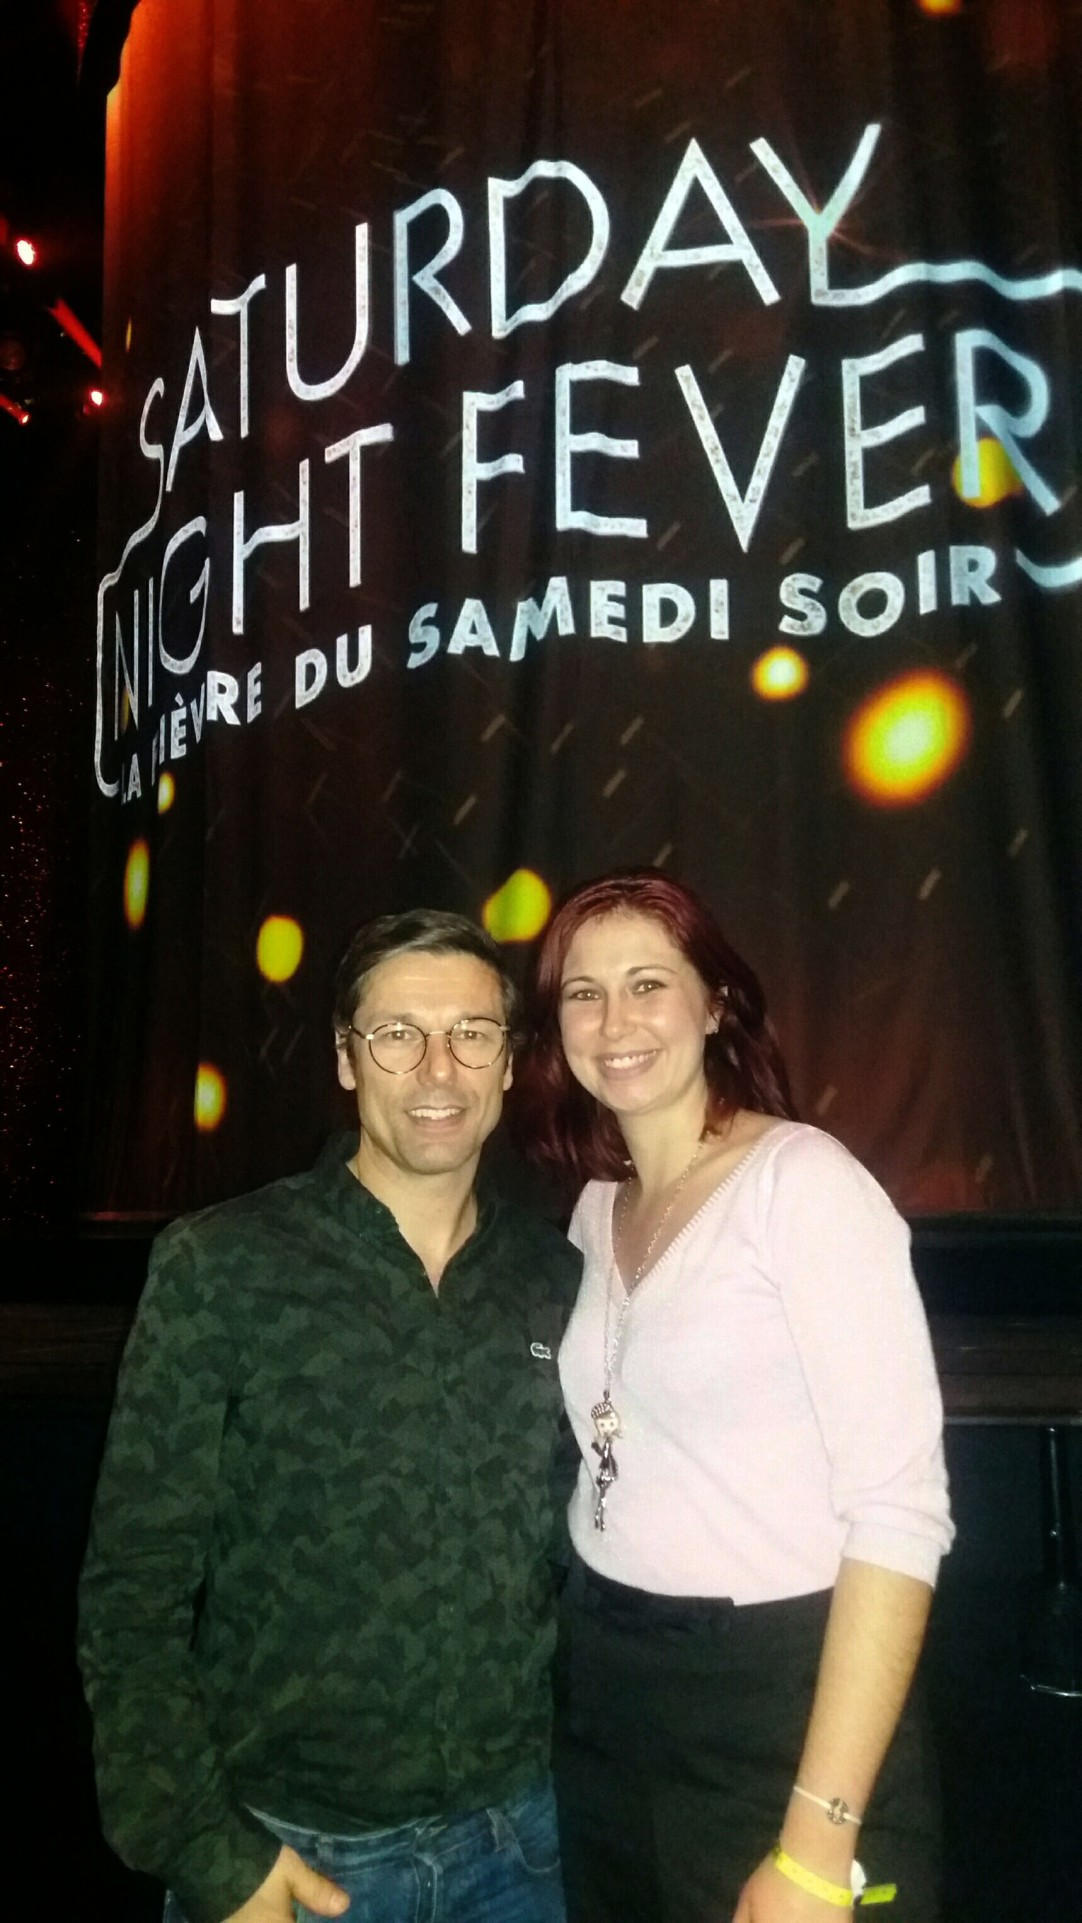 saturday-night-fever-stephane-jarny